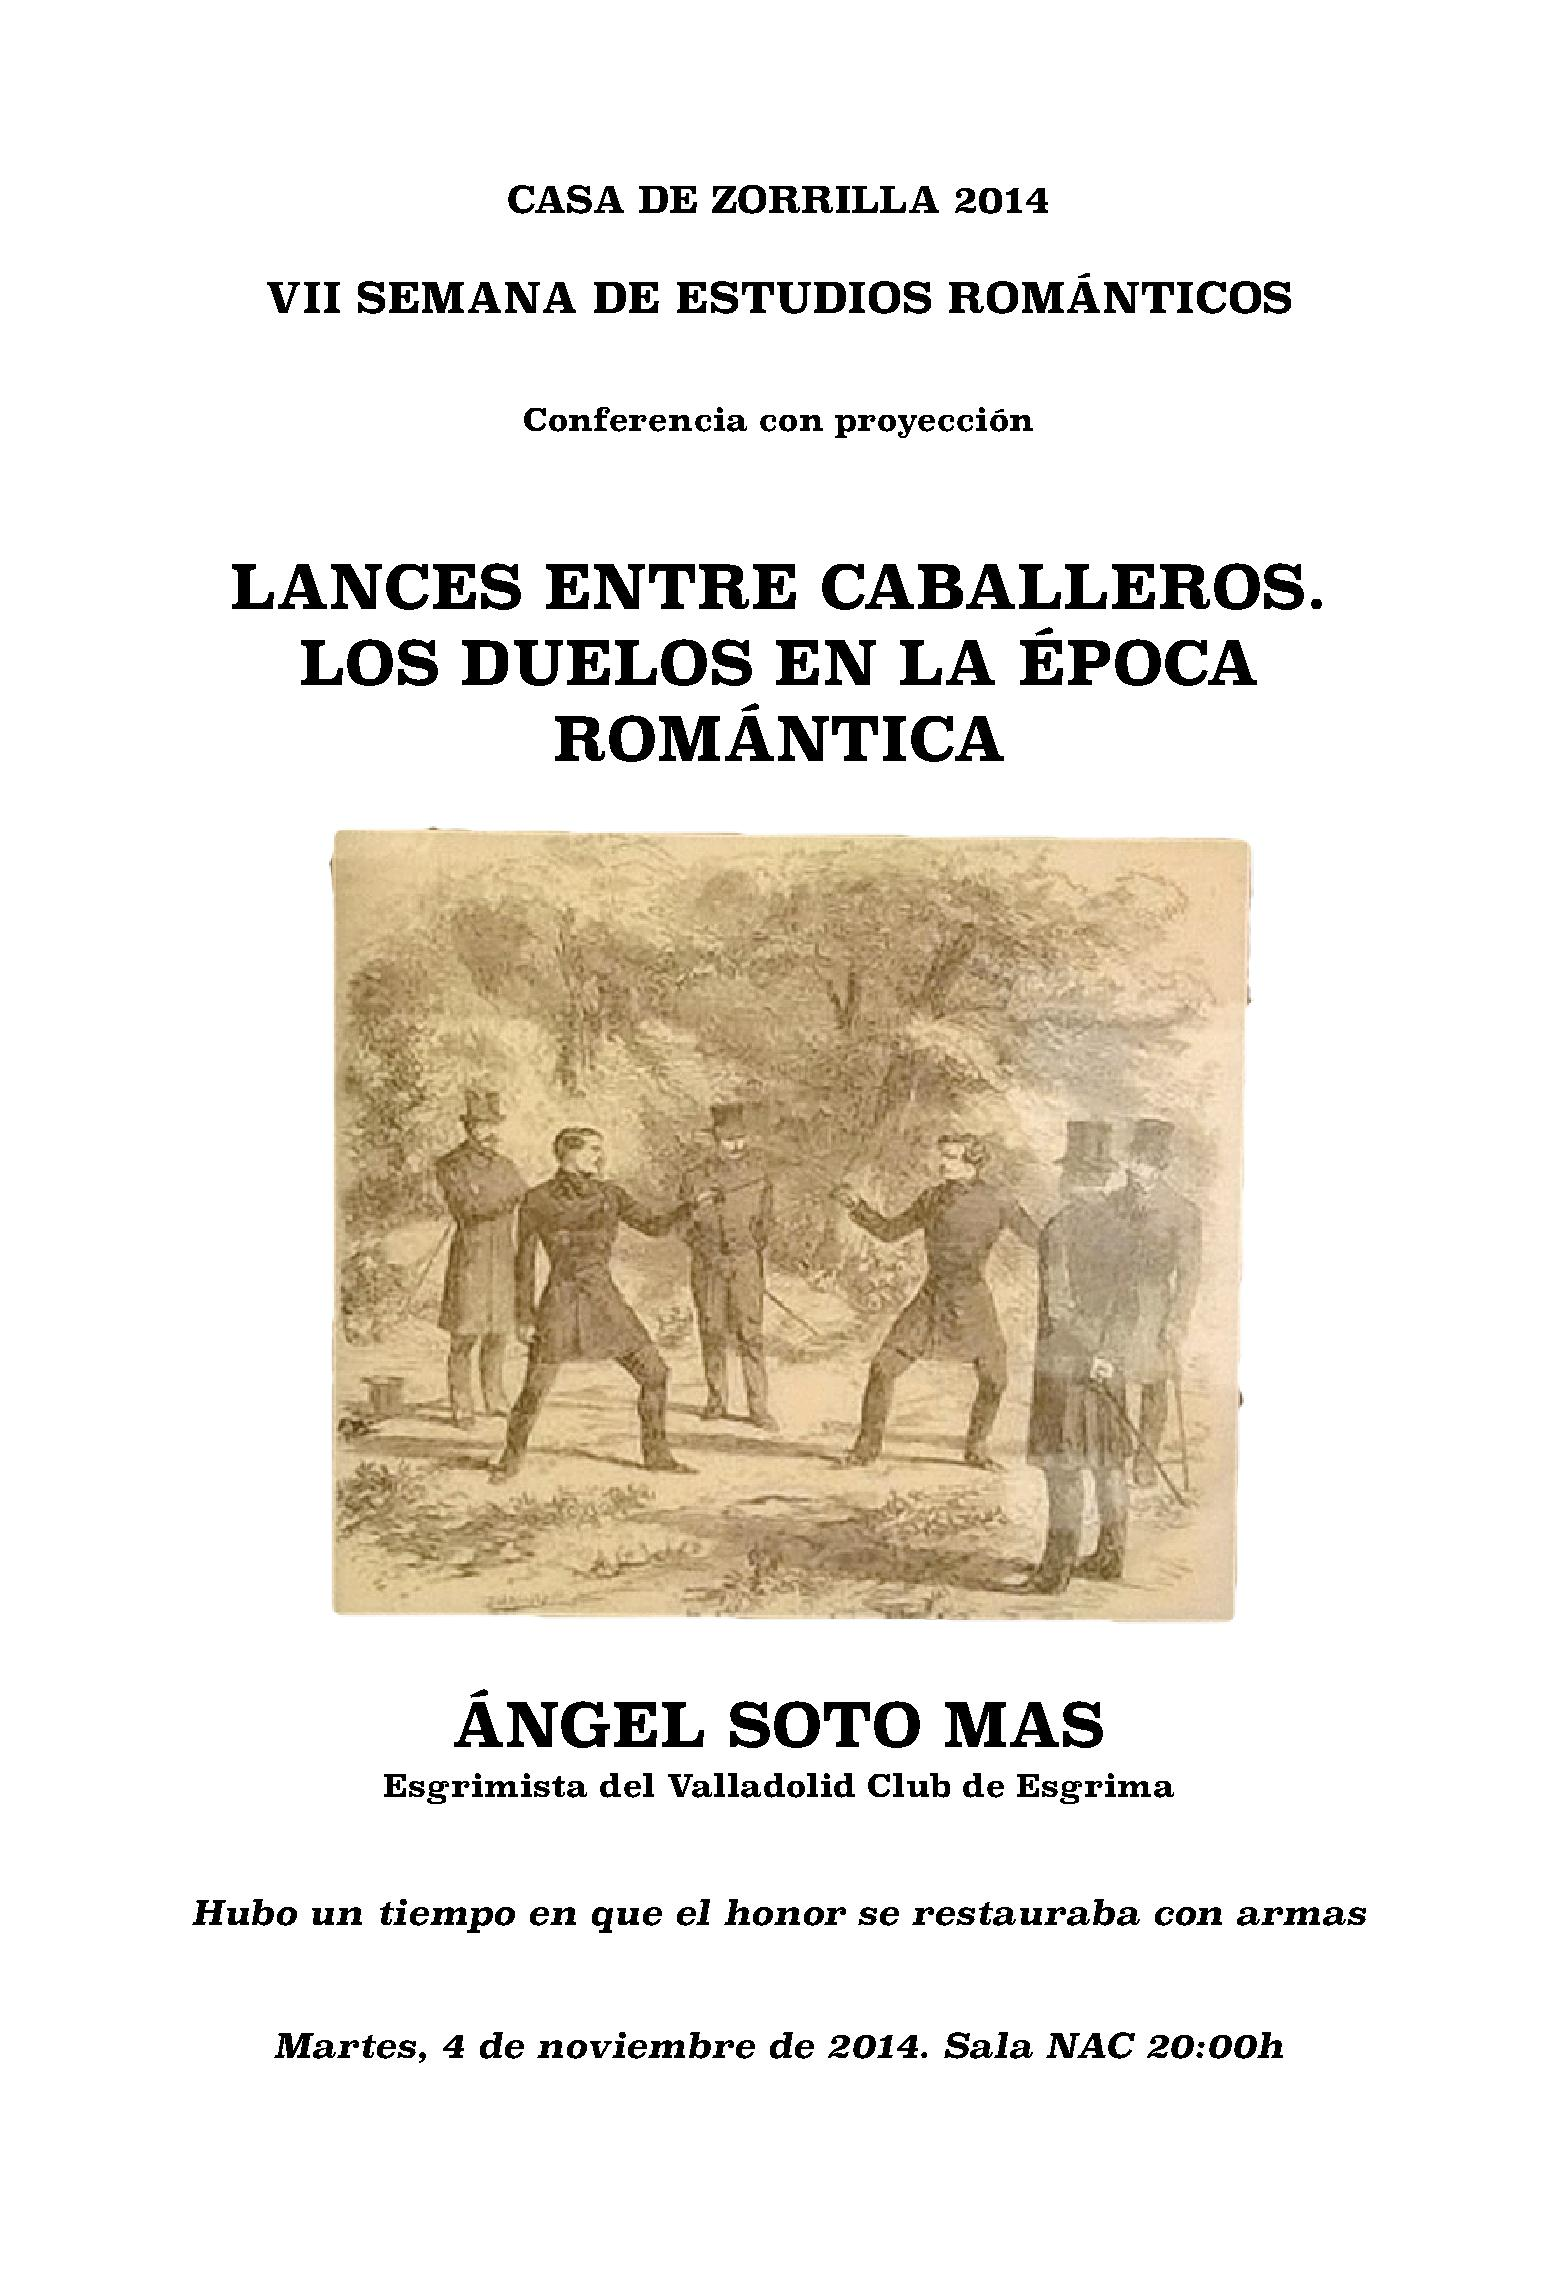 PUBLICACION - LANCES ENTRE CABALLEROS